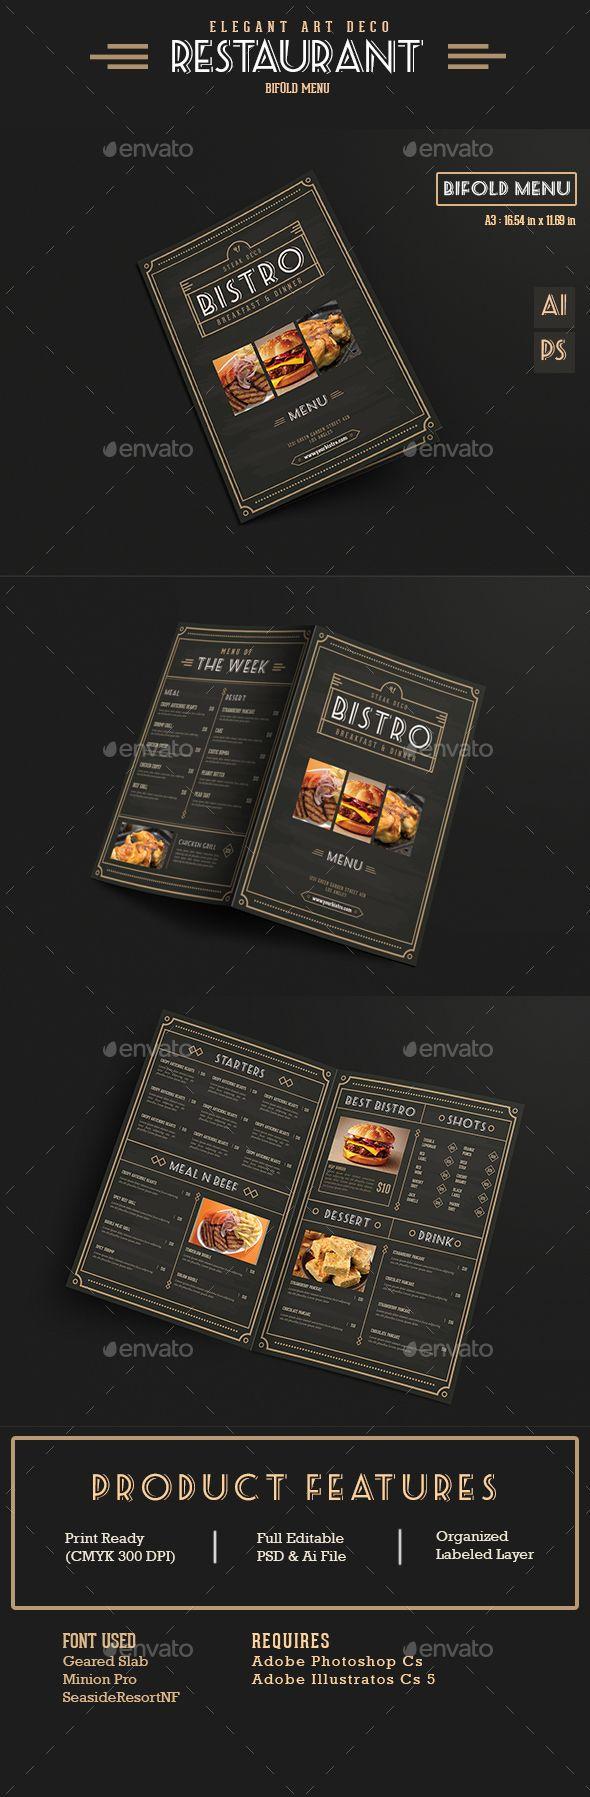 Elegant Bifold Restaurant Menu Template PSD, AI #design Download: http://graphicriver.net/item/elegant-bifold-restaurant-menu/13786387?ref=ksioks